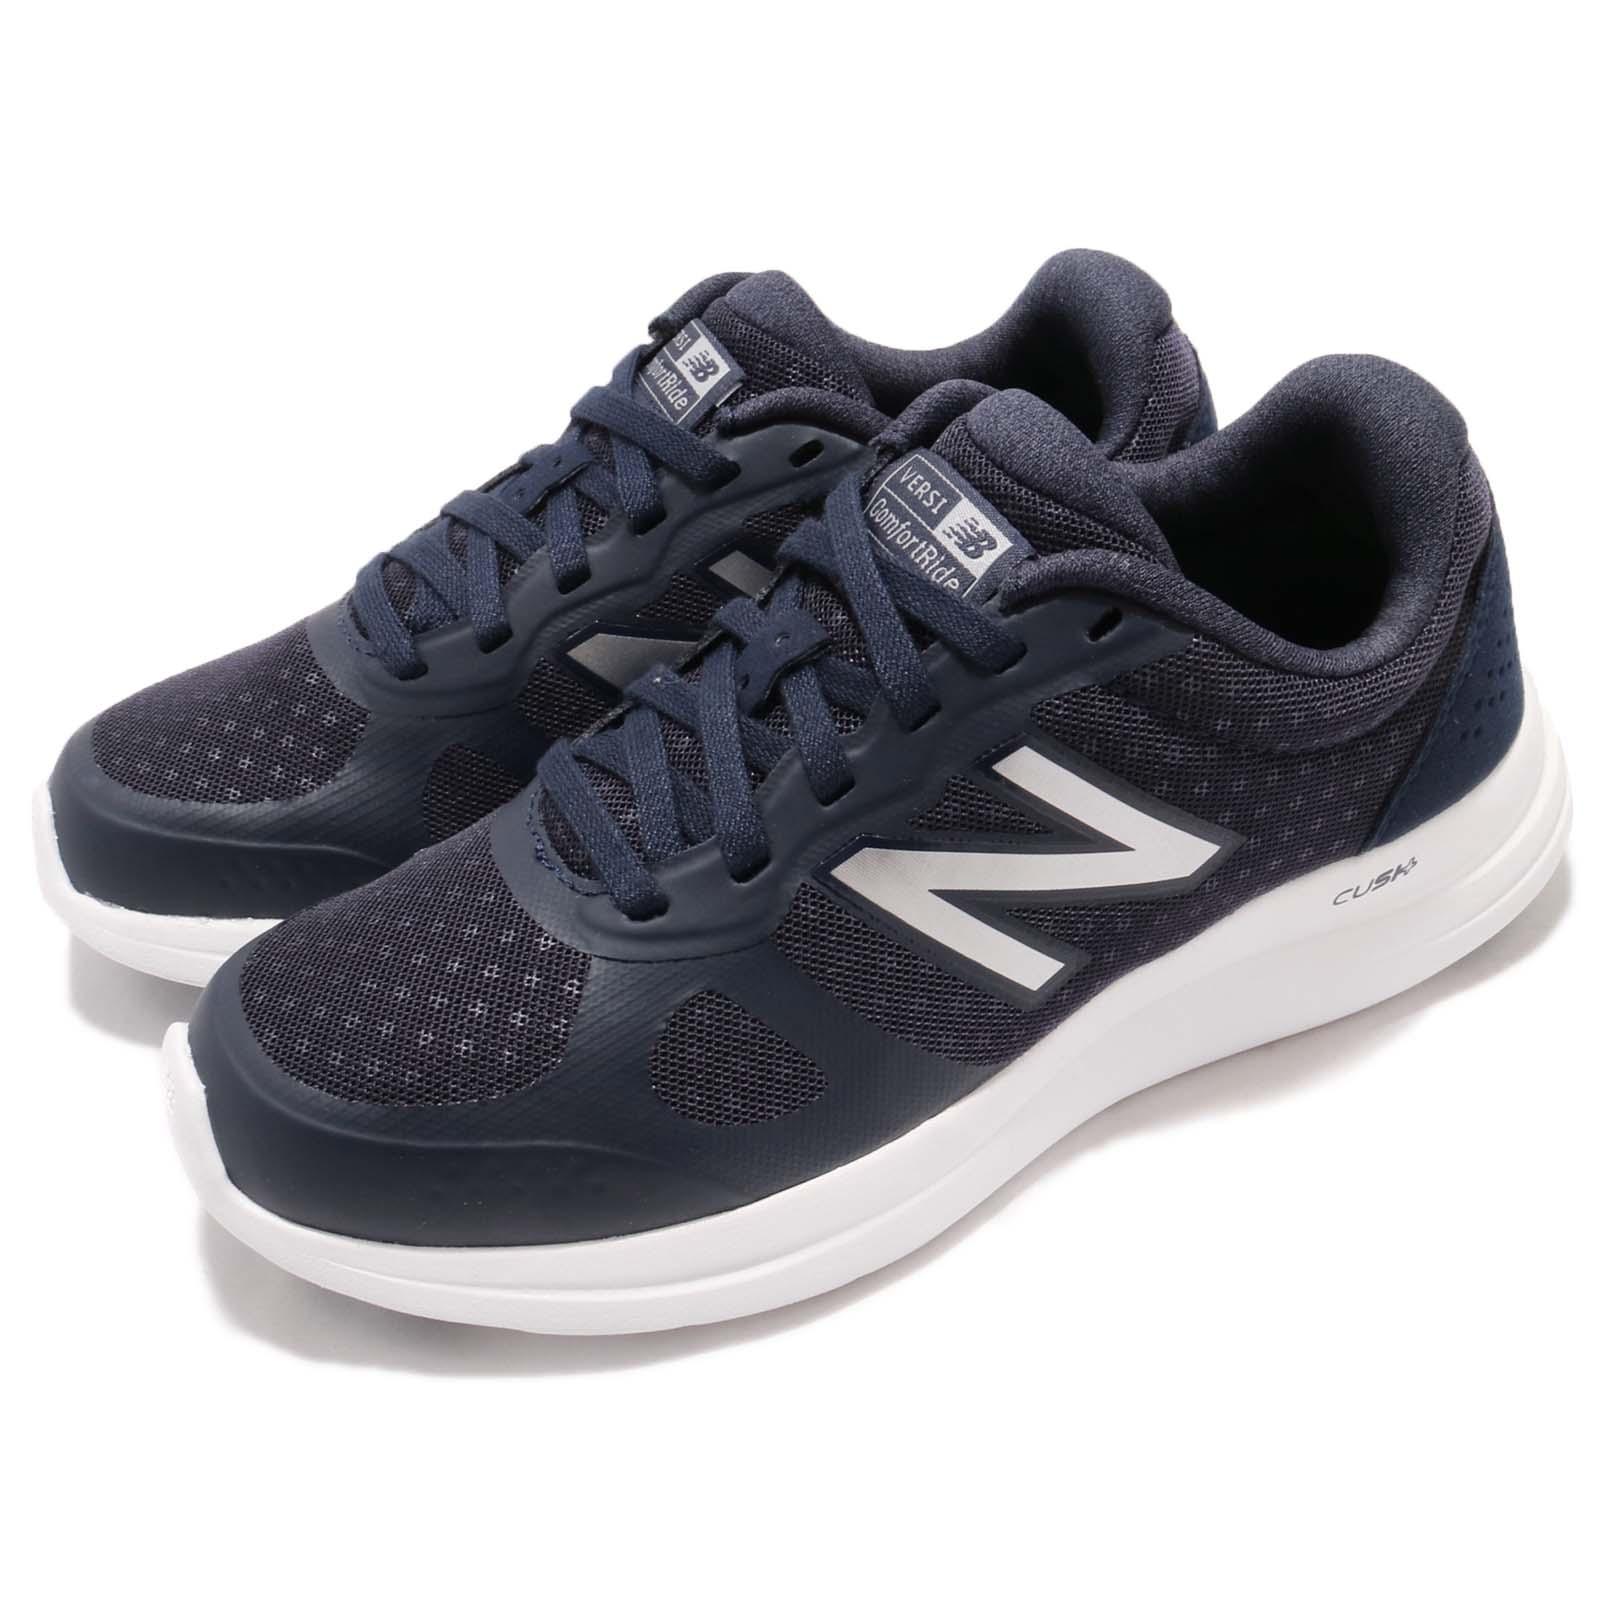 New Balance WVERSLJ1 D Wide Navy Silver Women Running Shoes Sneakers ... 82255ac4e15ca